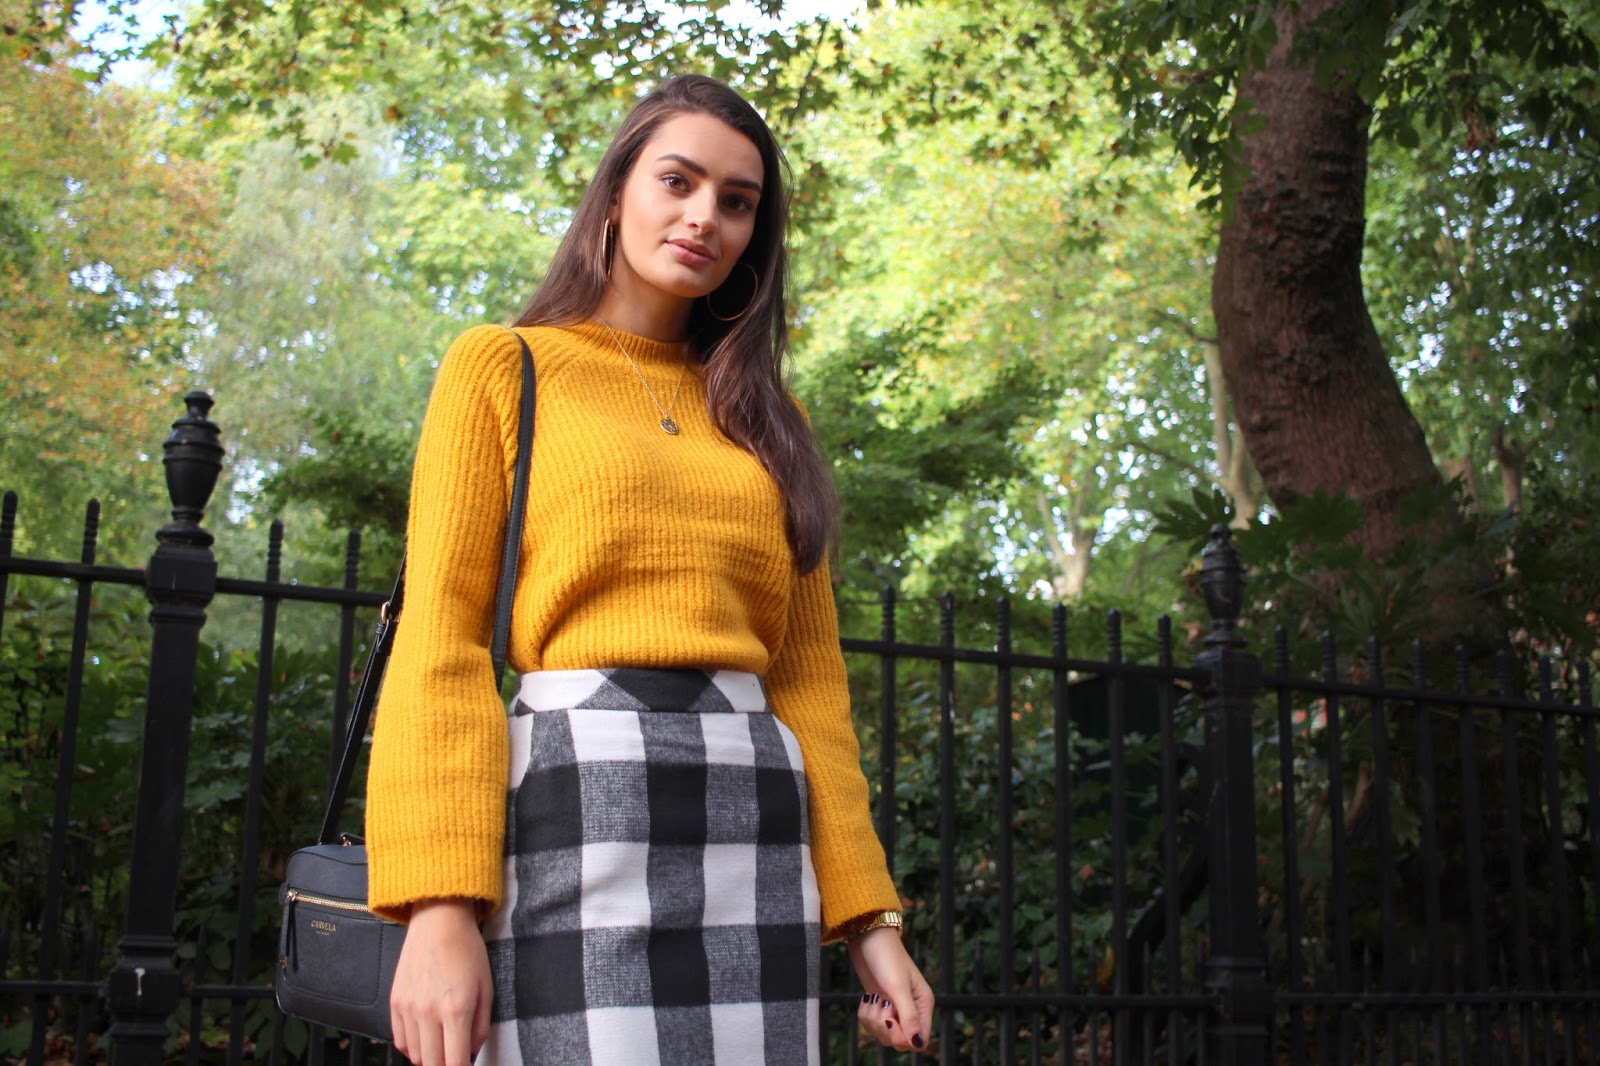 peexo blogger personal style autumn primark